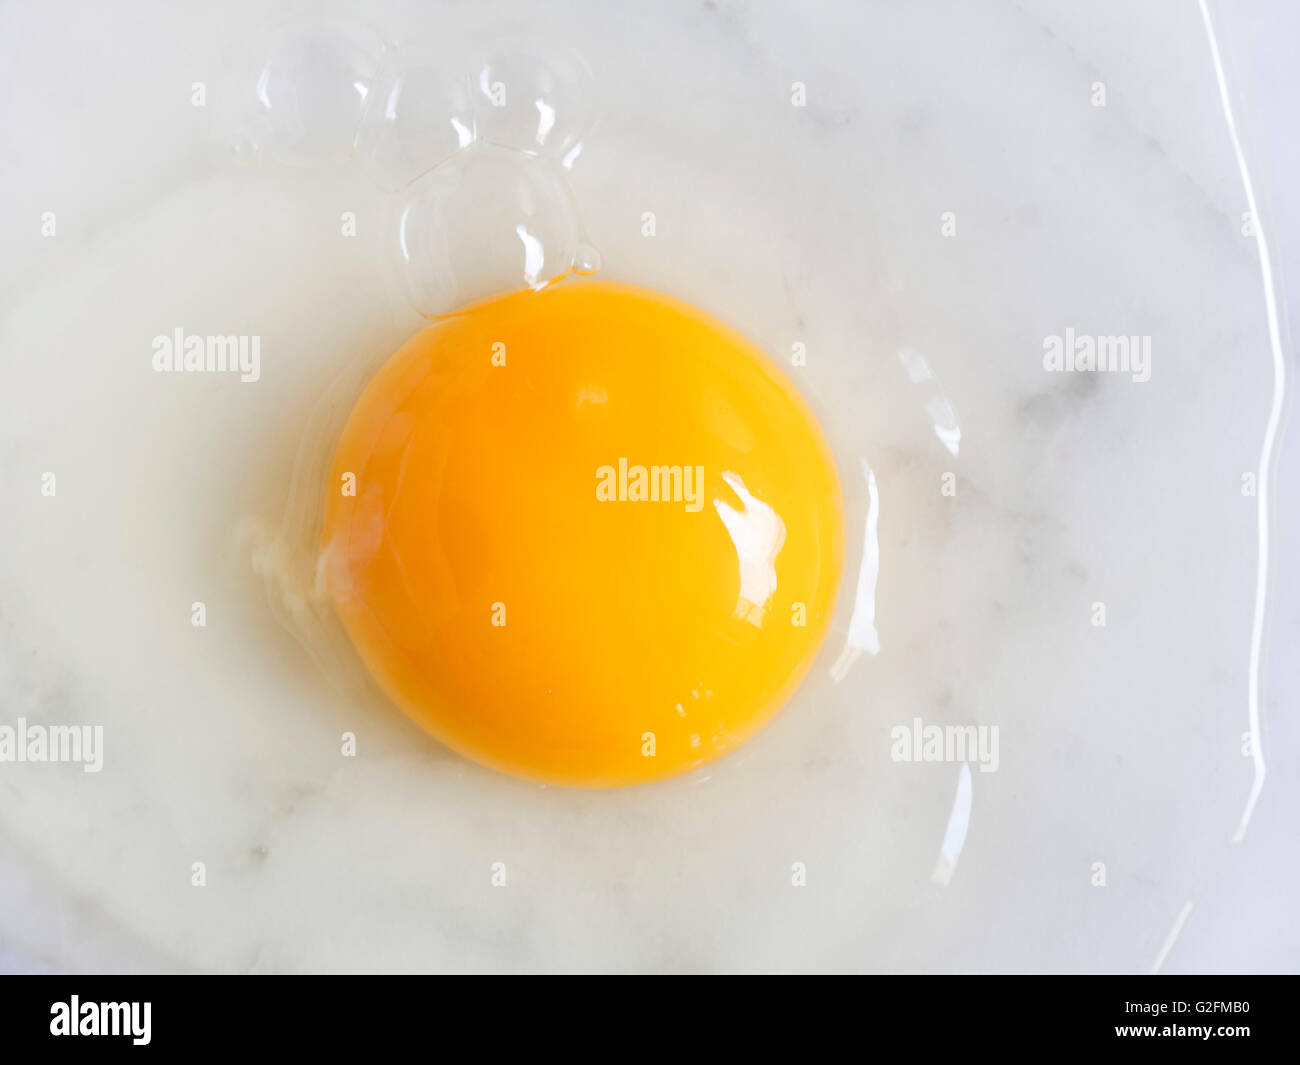 Egg Yoke On Counter - Stock Image